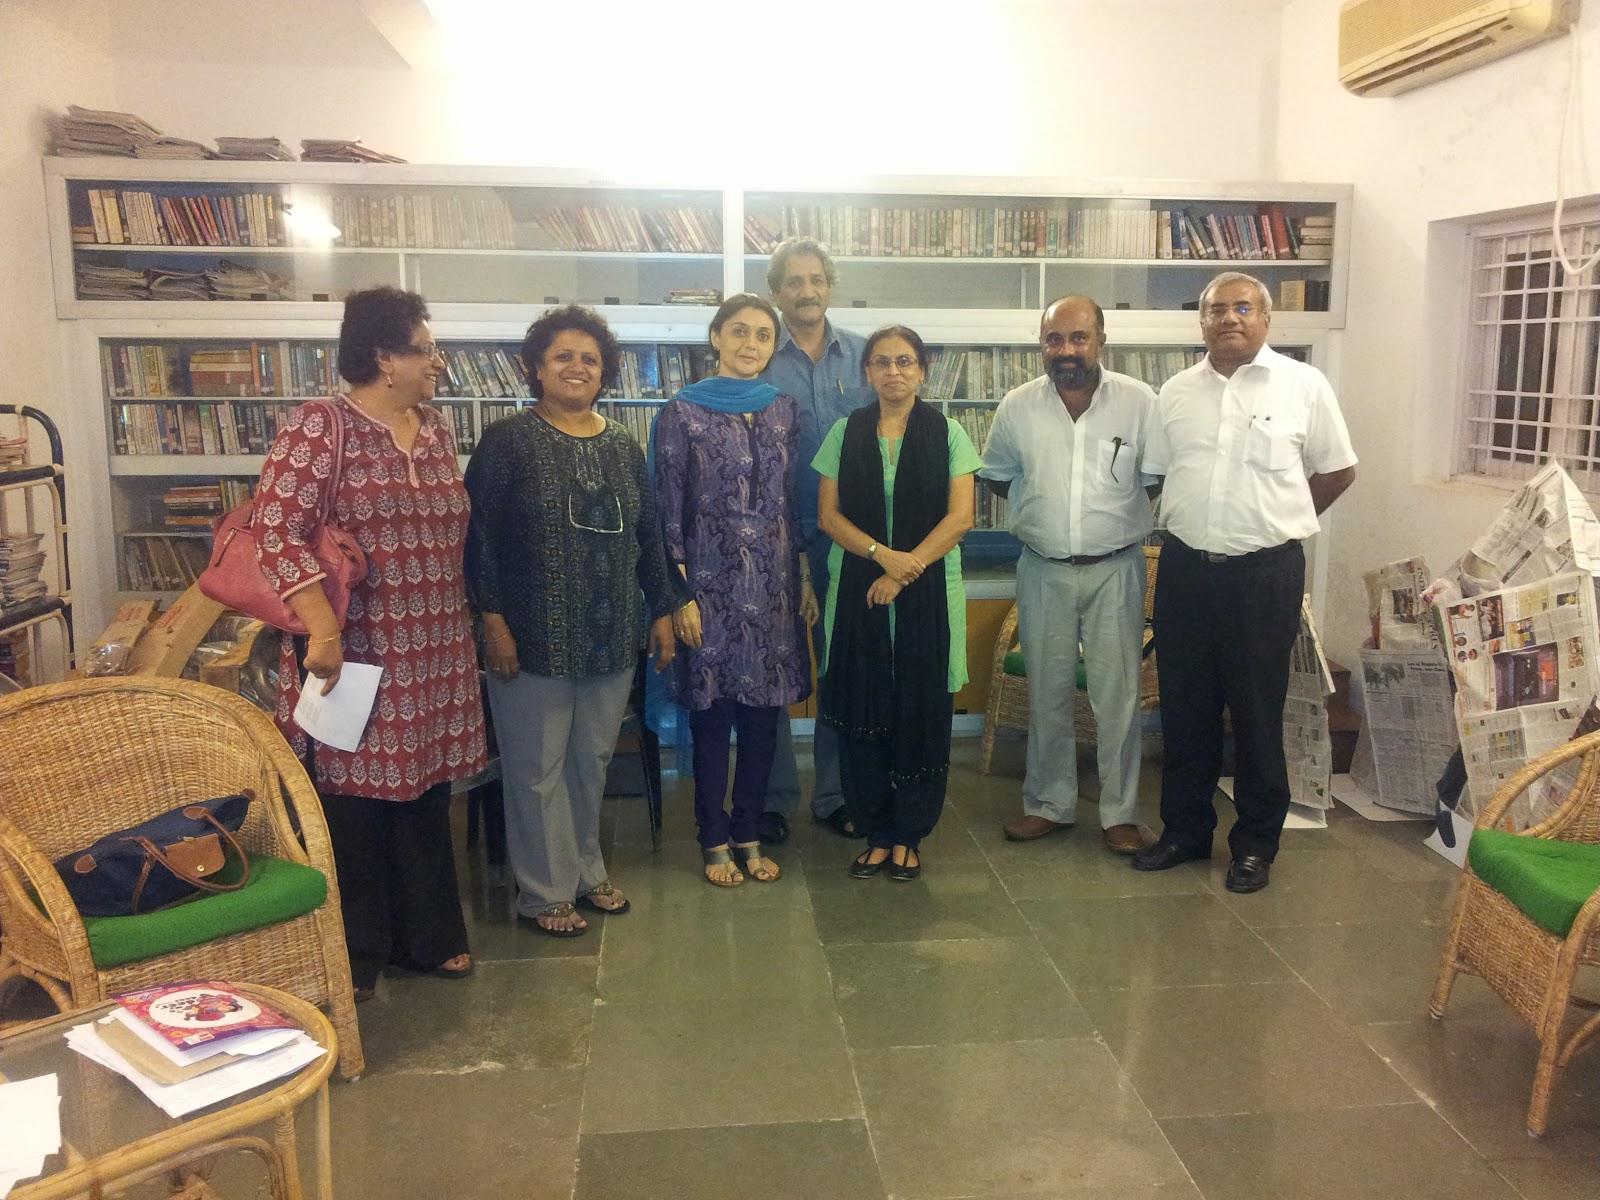 KRG - The Kochi Reading Group: Poetry Reading - Jun 26, 2015